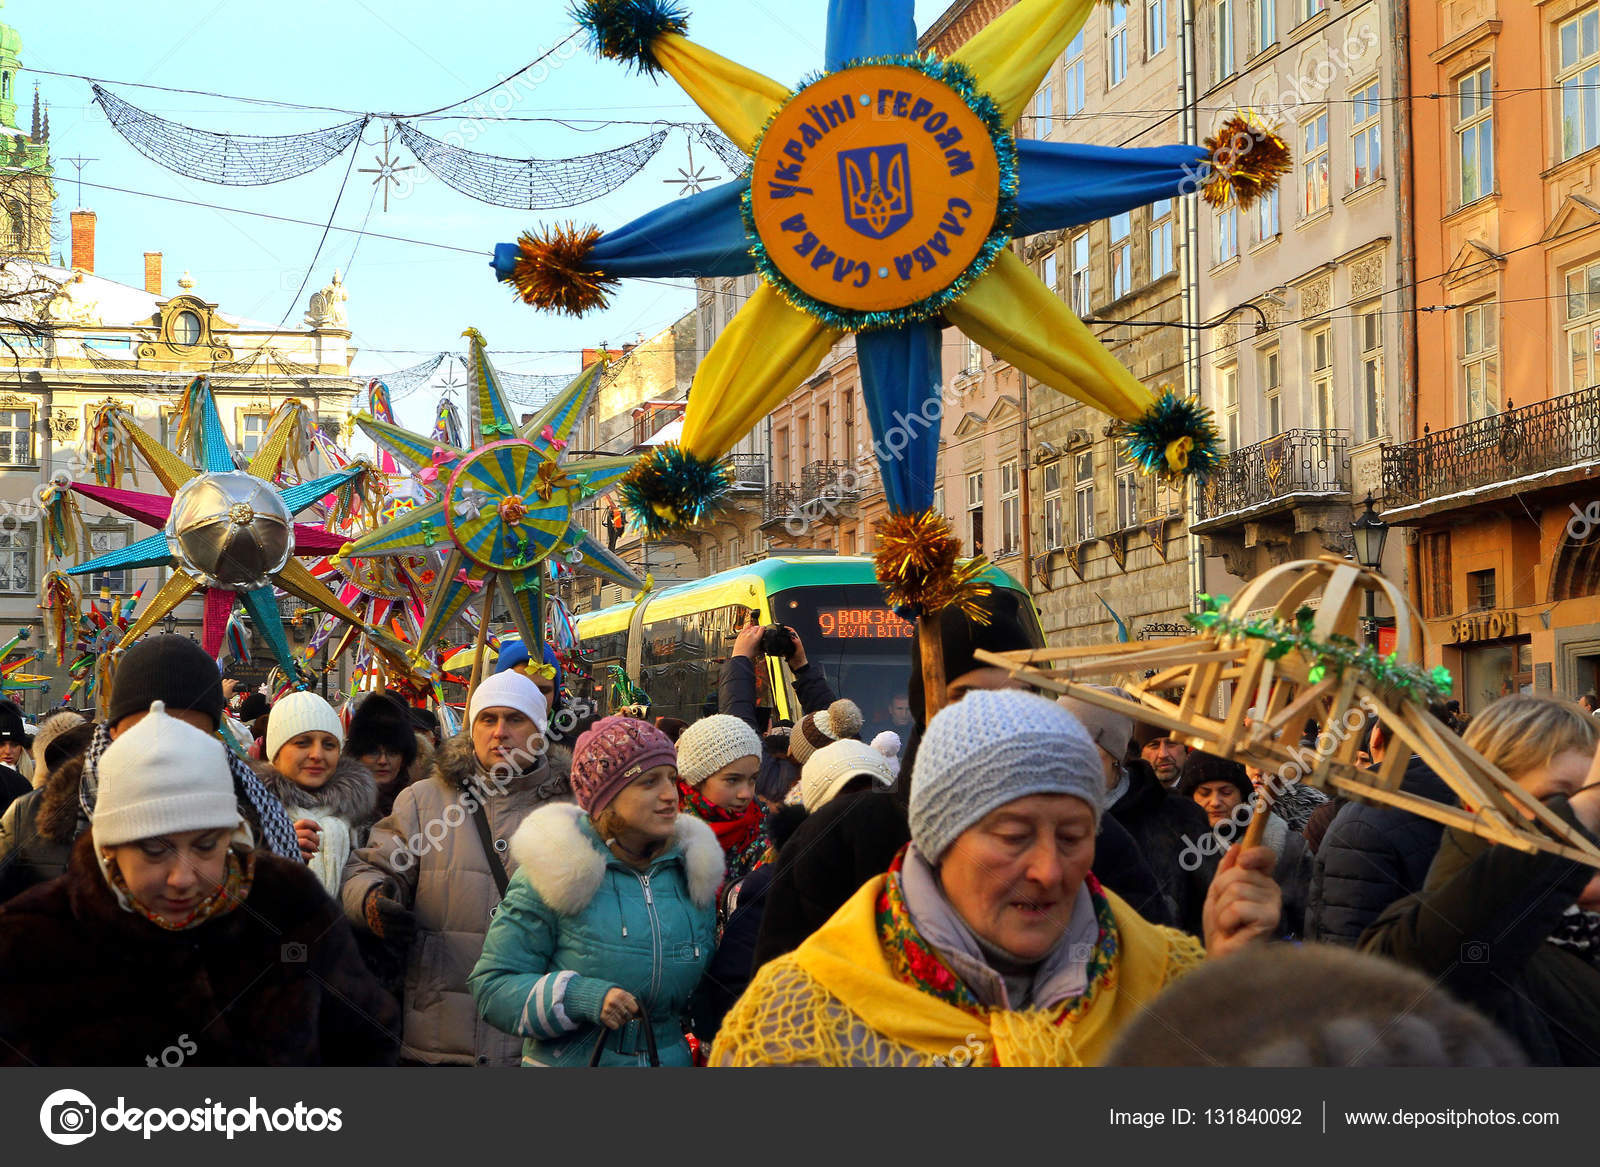 Orthodoxe Weihnachten.Orthodoxe Weihnachten Zu Feiern In Lemberg Redaktionelles